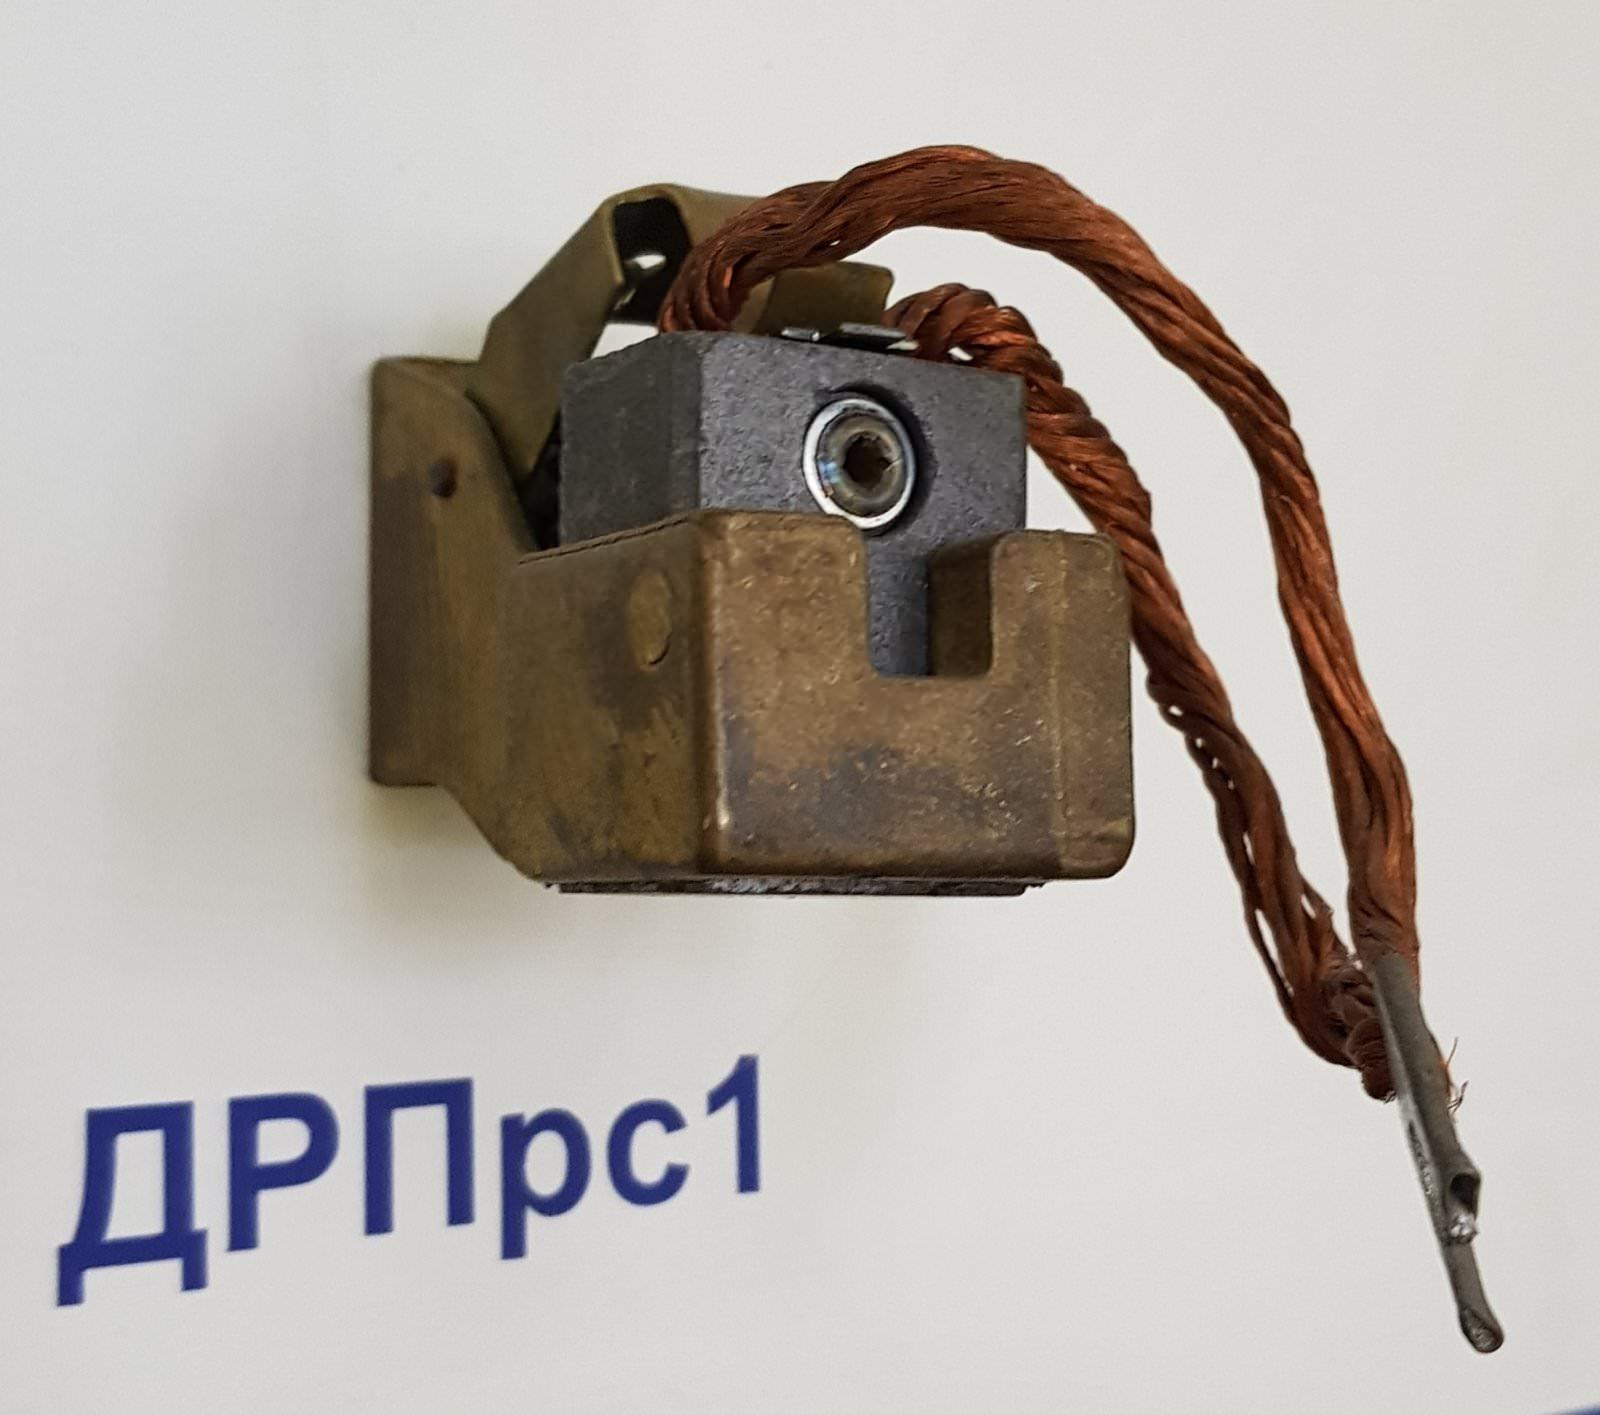 Щеткодержатель ДРПрс1